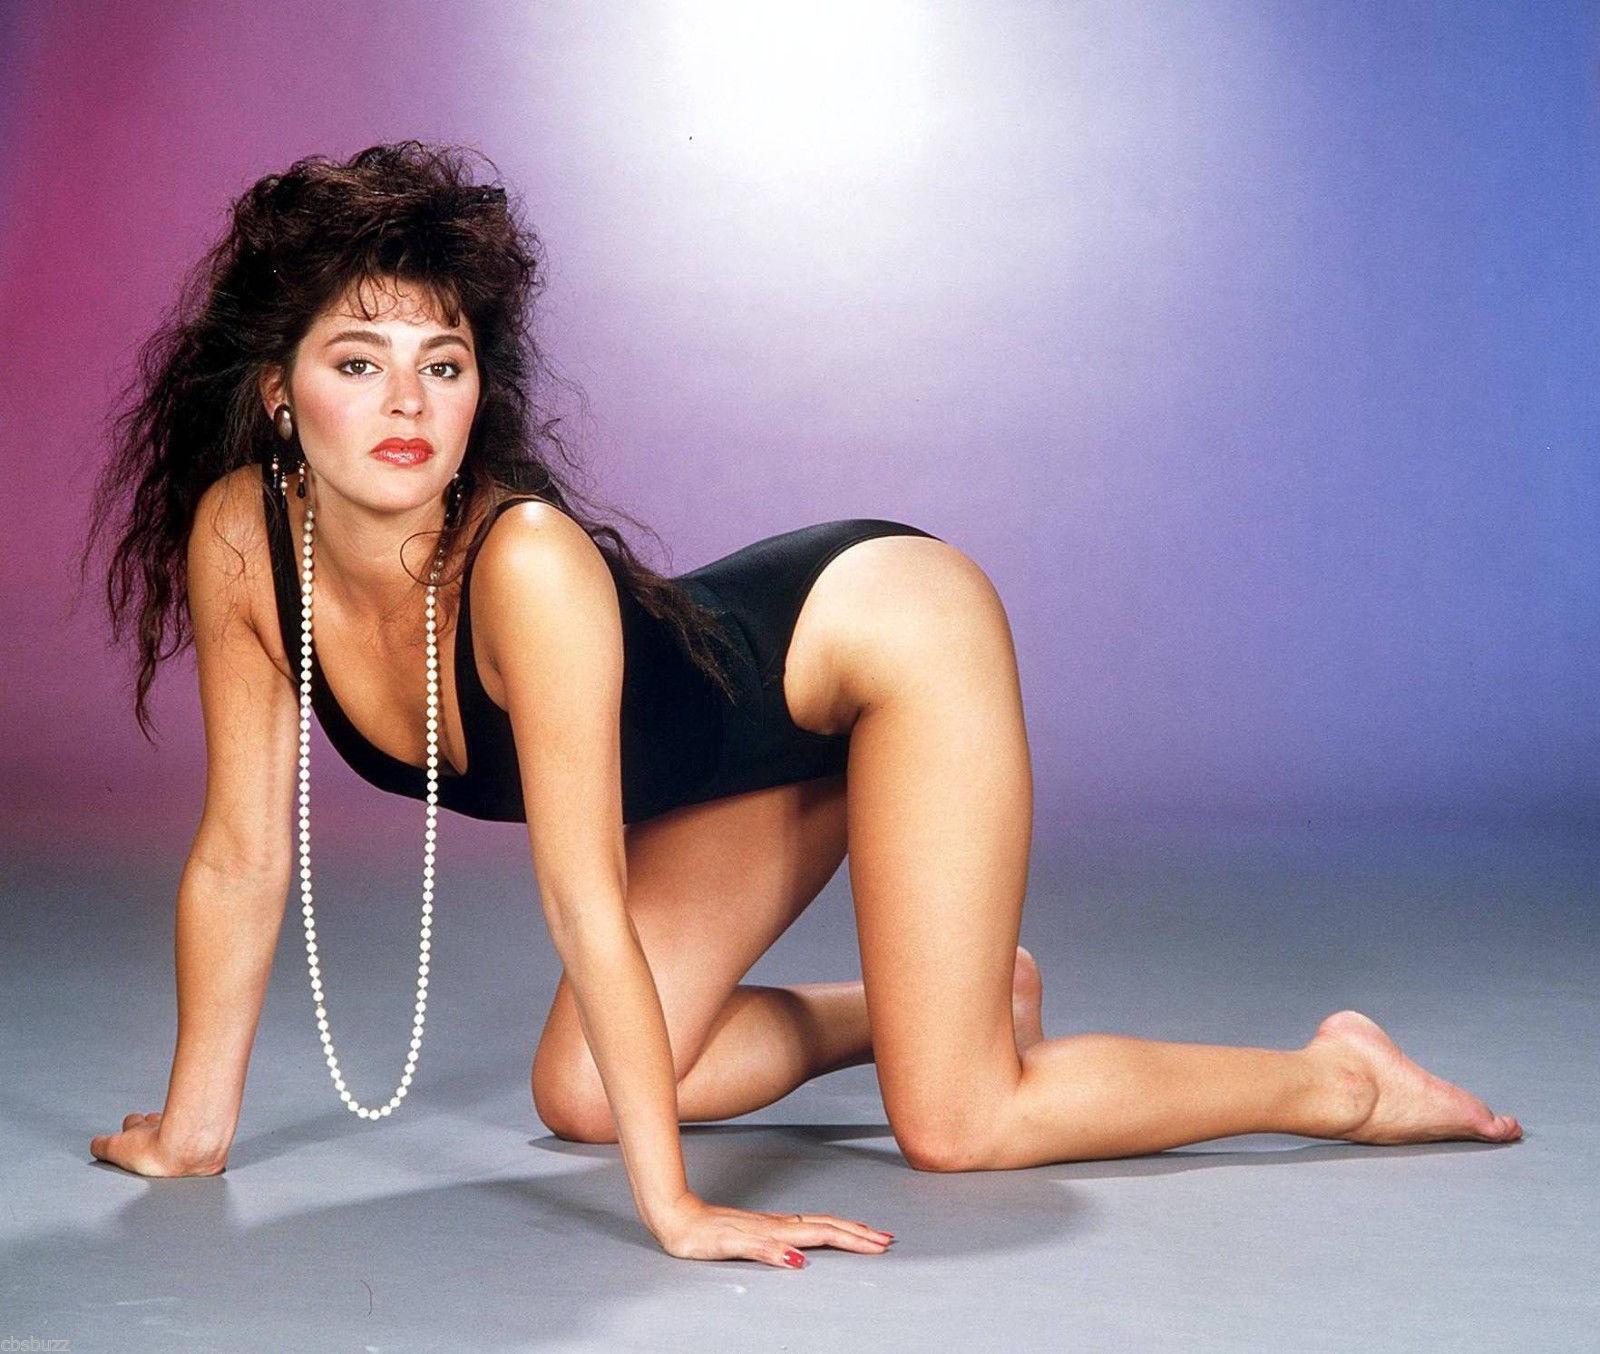 gif hot porn gangbang sexy